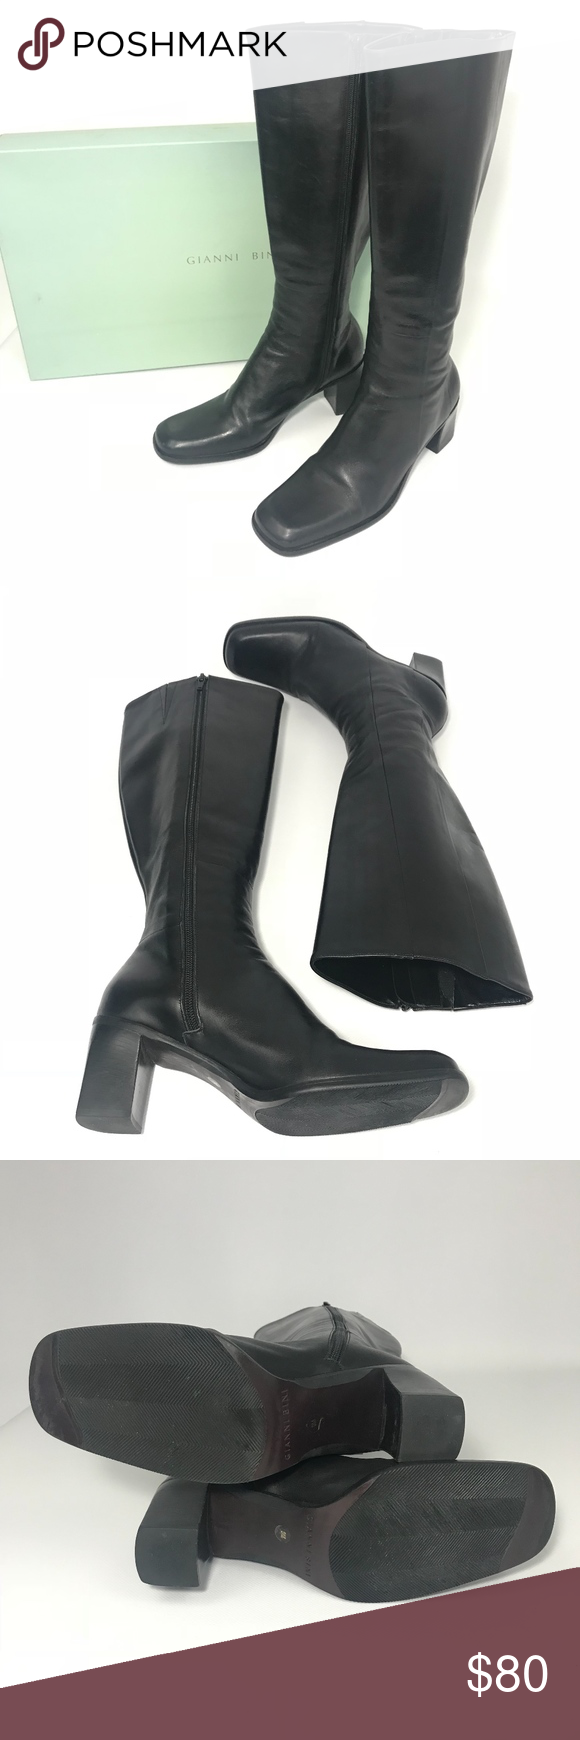 Gianni Bini Black Leather Knee High Fashion Boot   Fashion ...